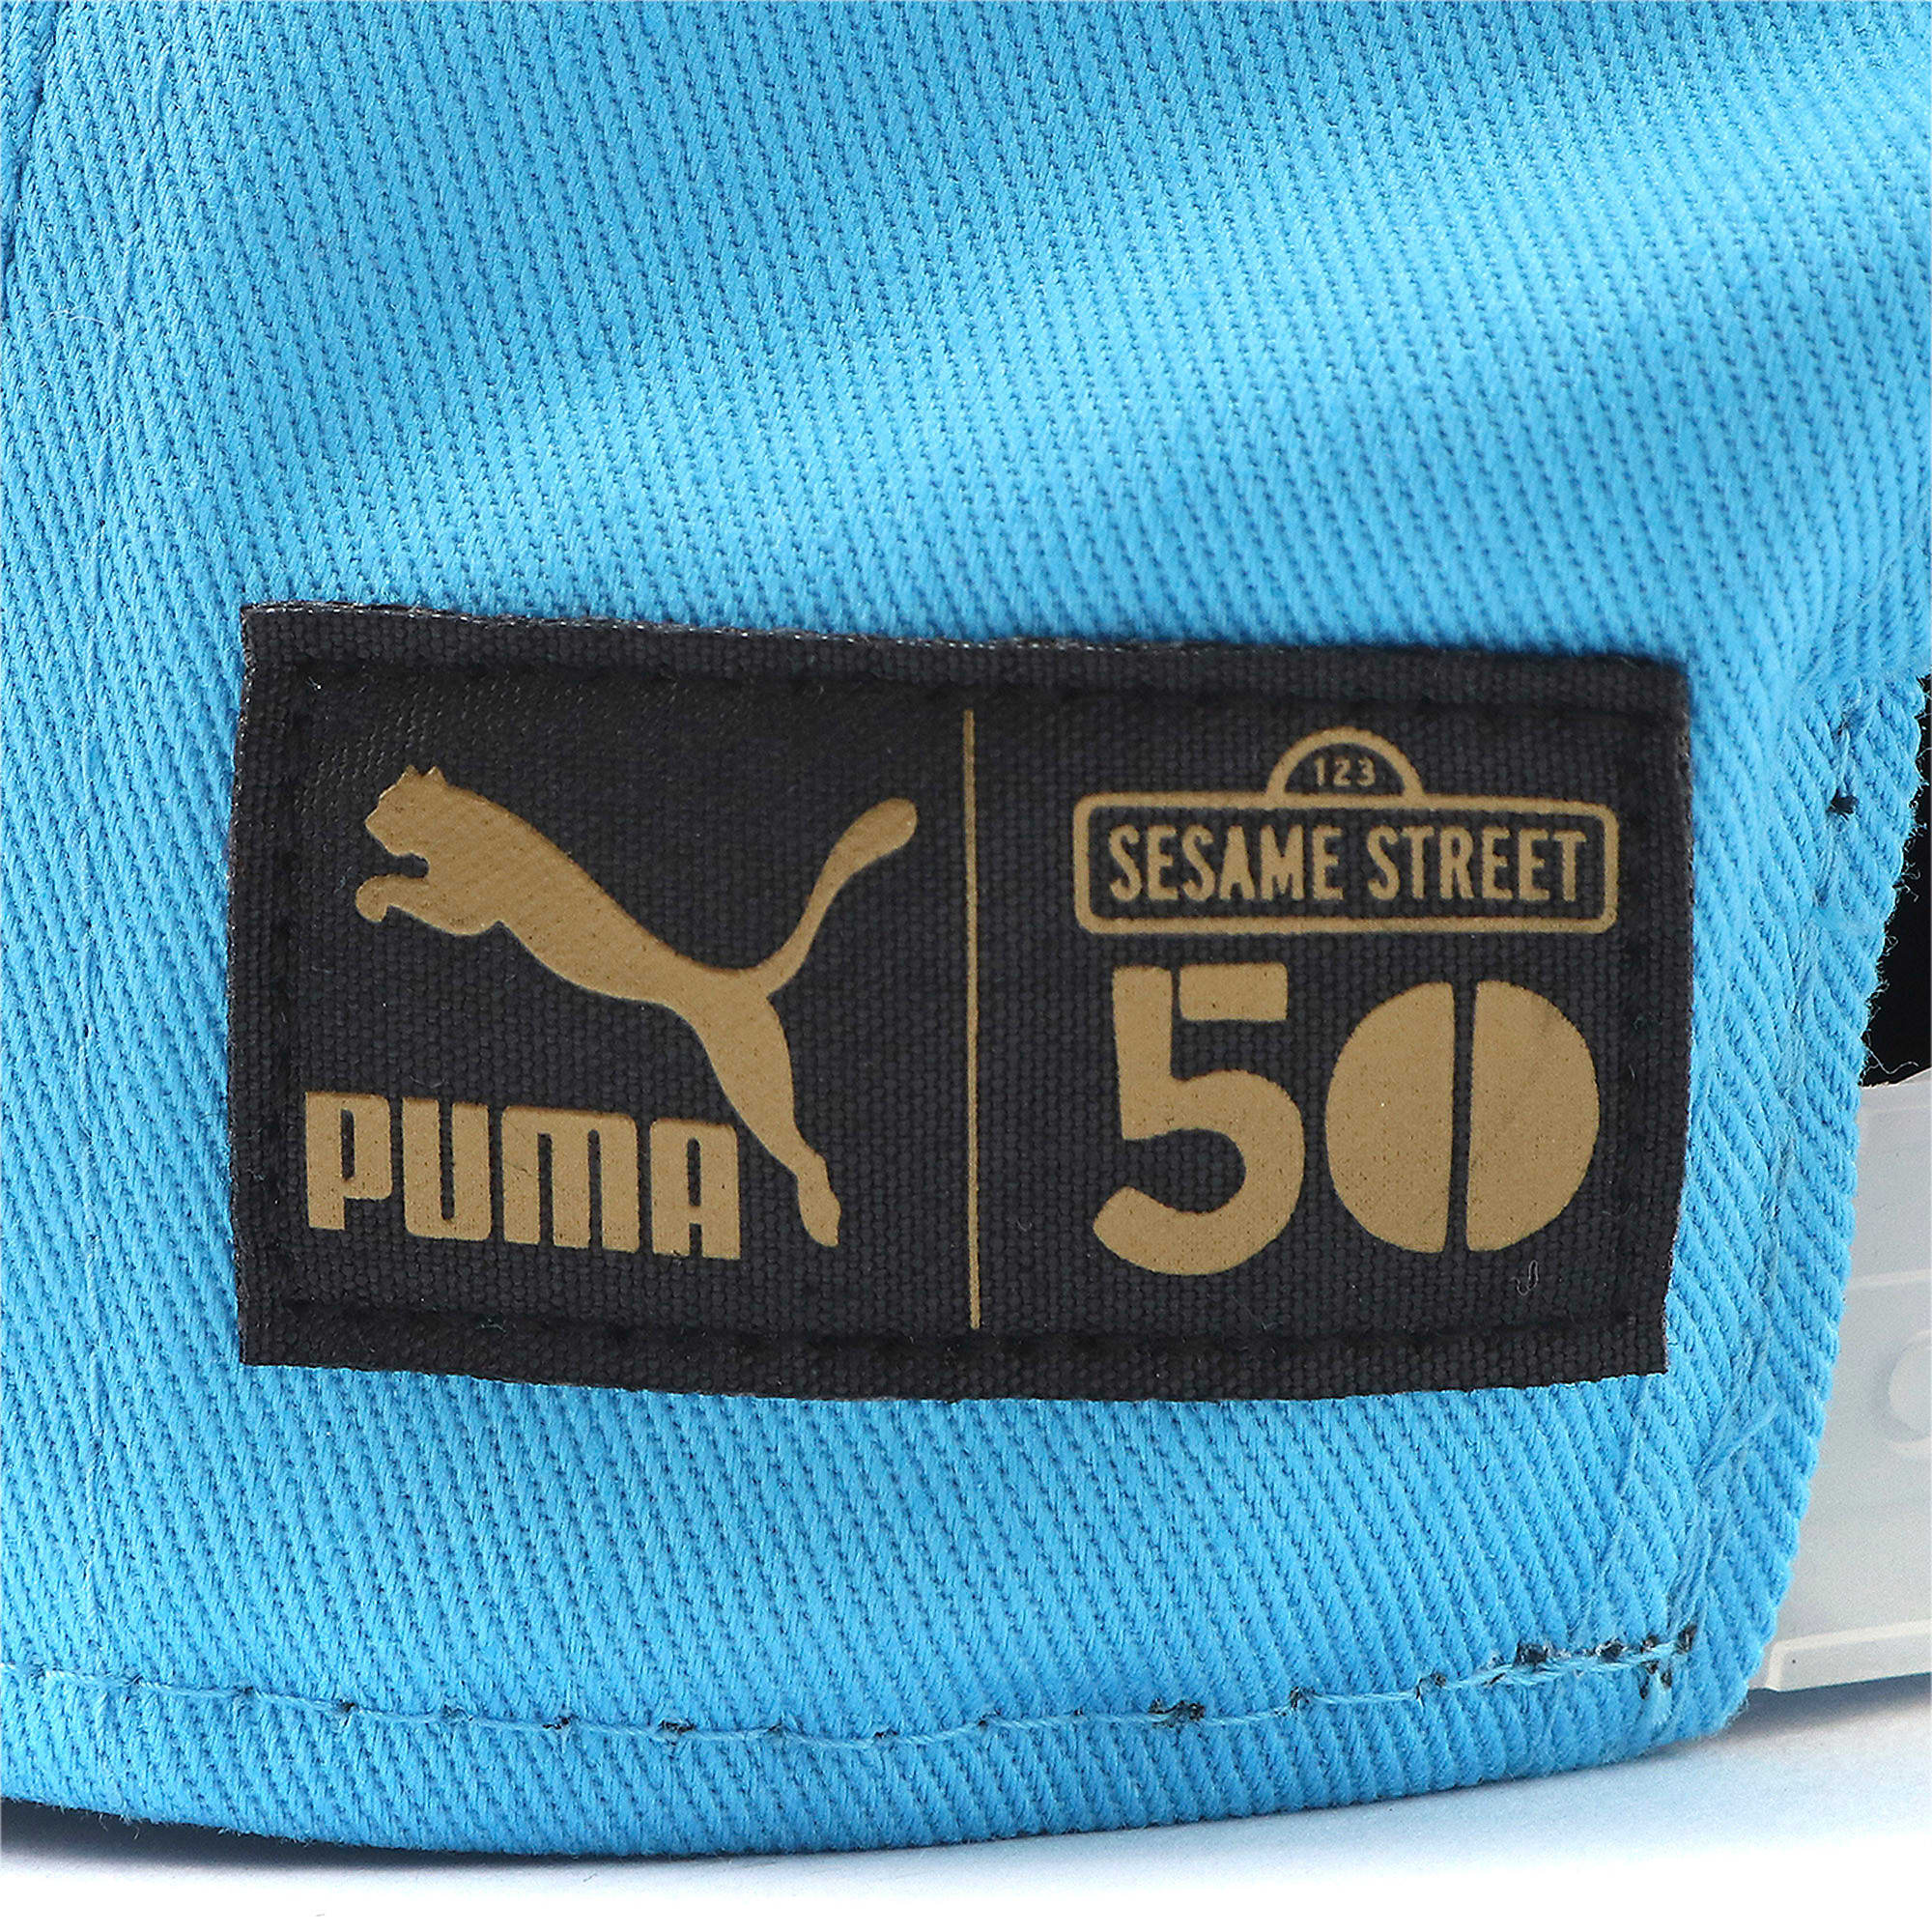 Thumbnail 3 of キッズ セサミストリート FB キャップ, Puma Black-Bleu Azur, medium-JPN